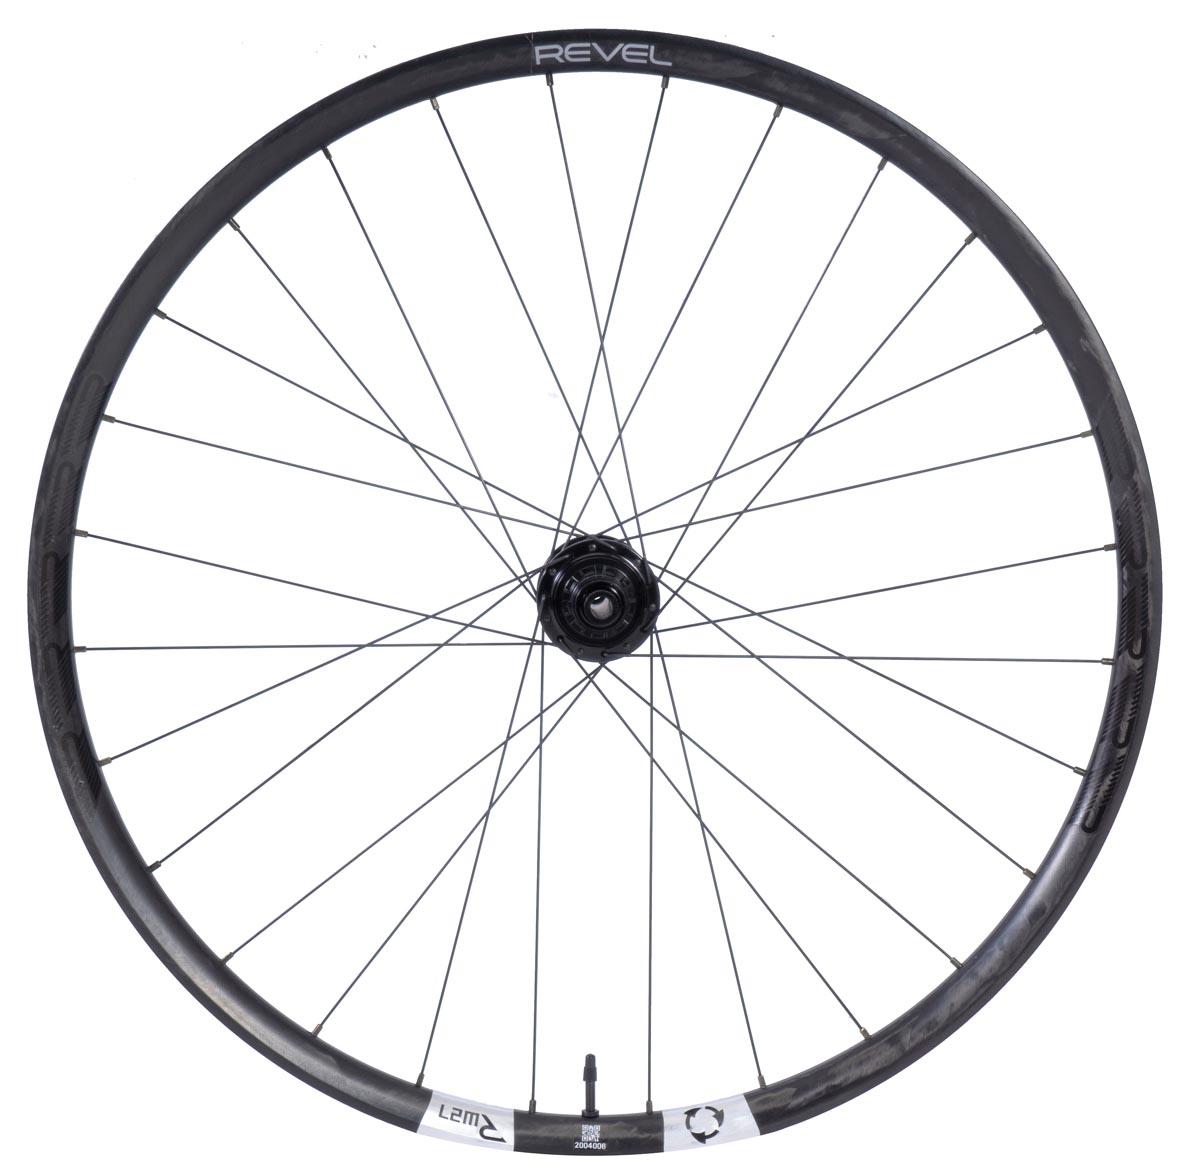 Revel Wheels RW27 MTB wheel